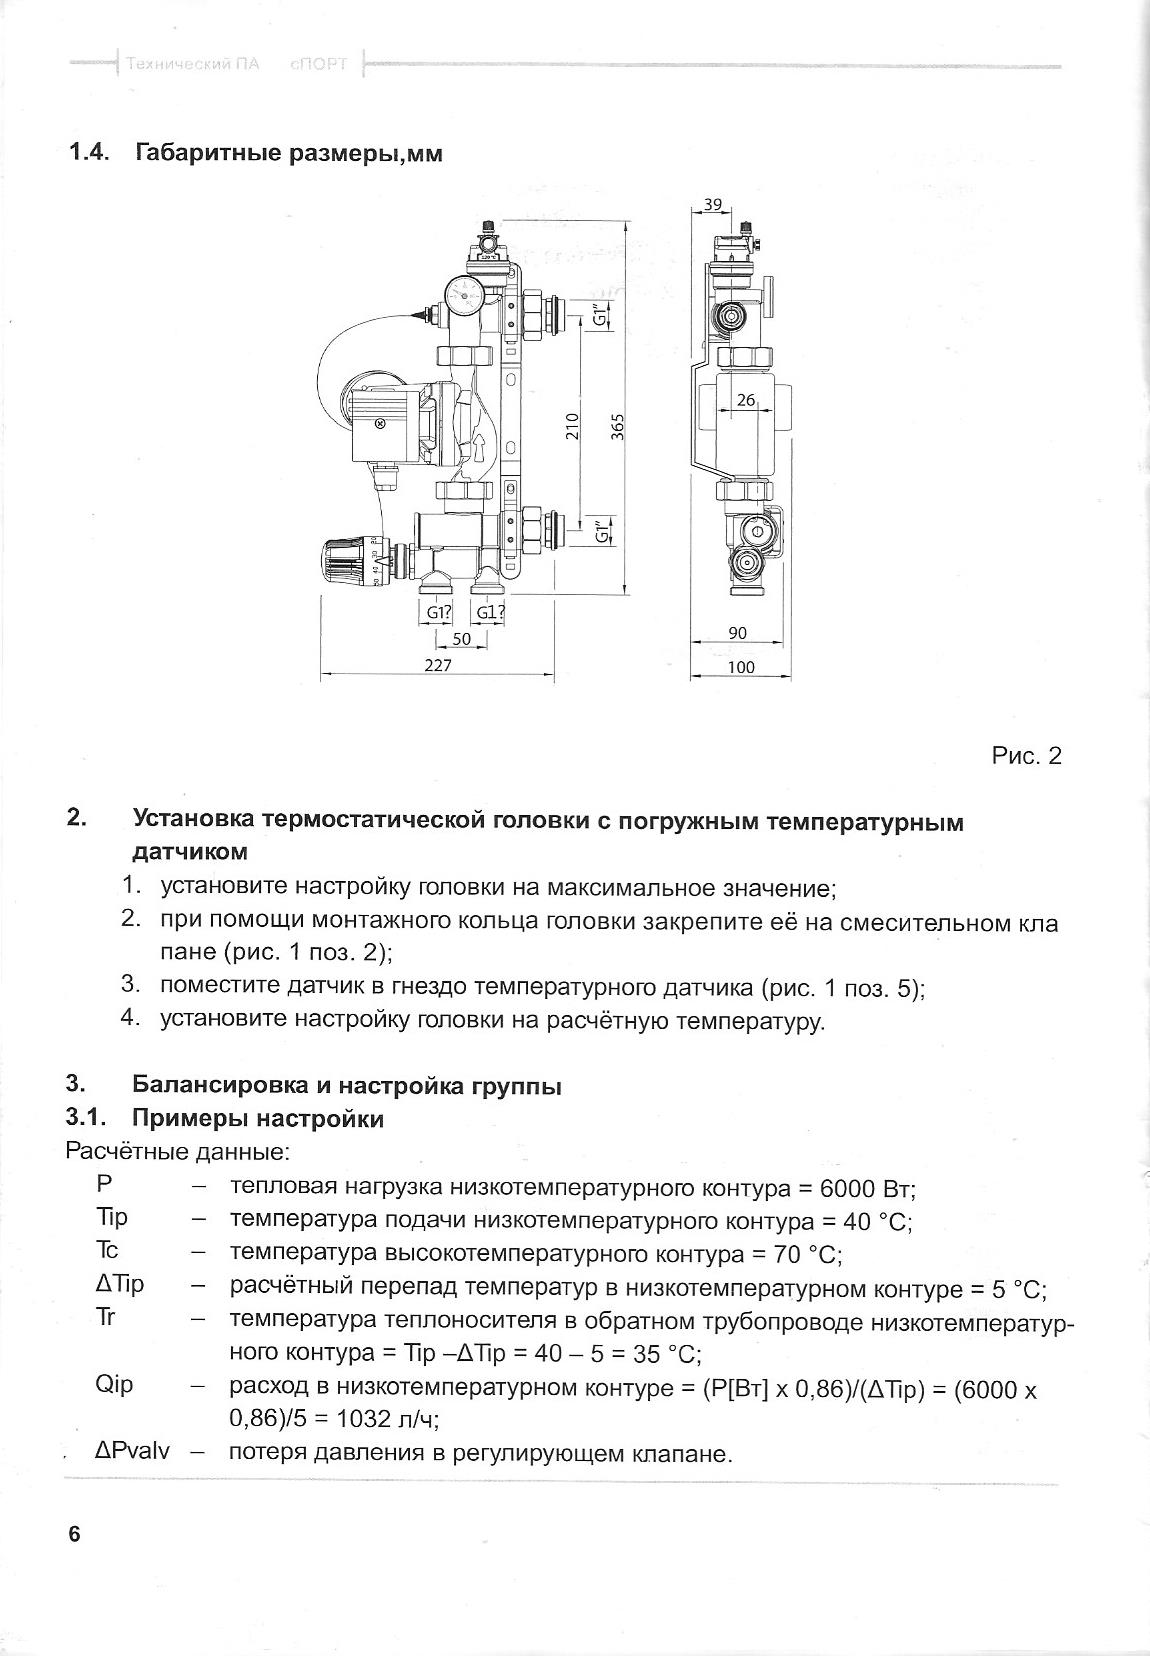 стр 5